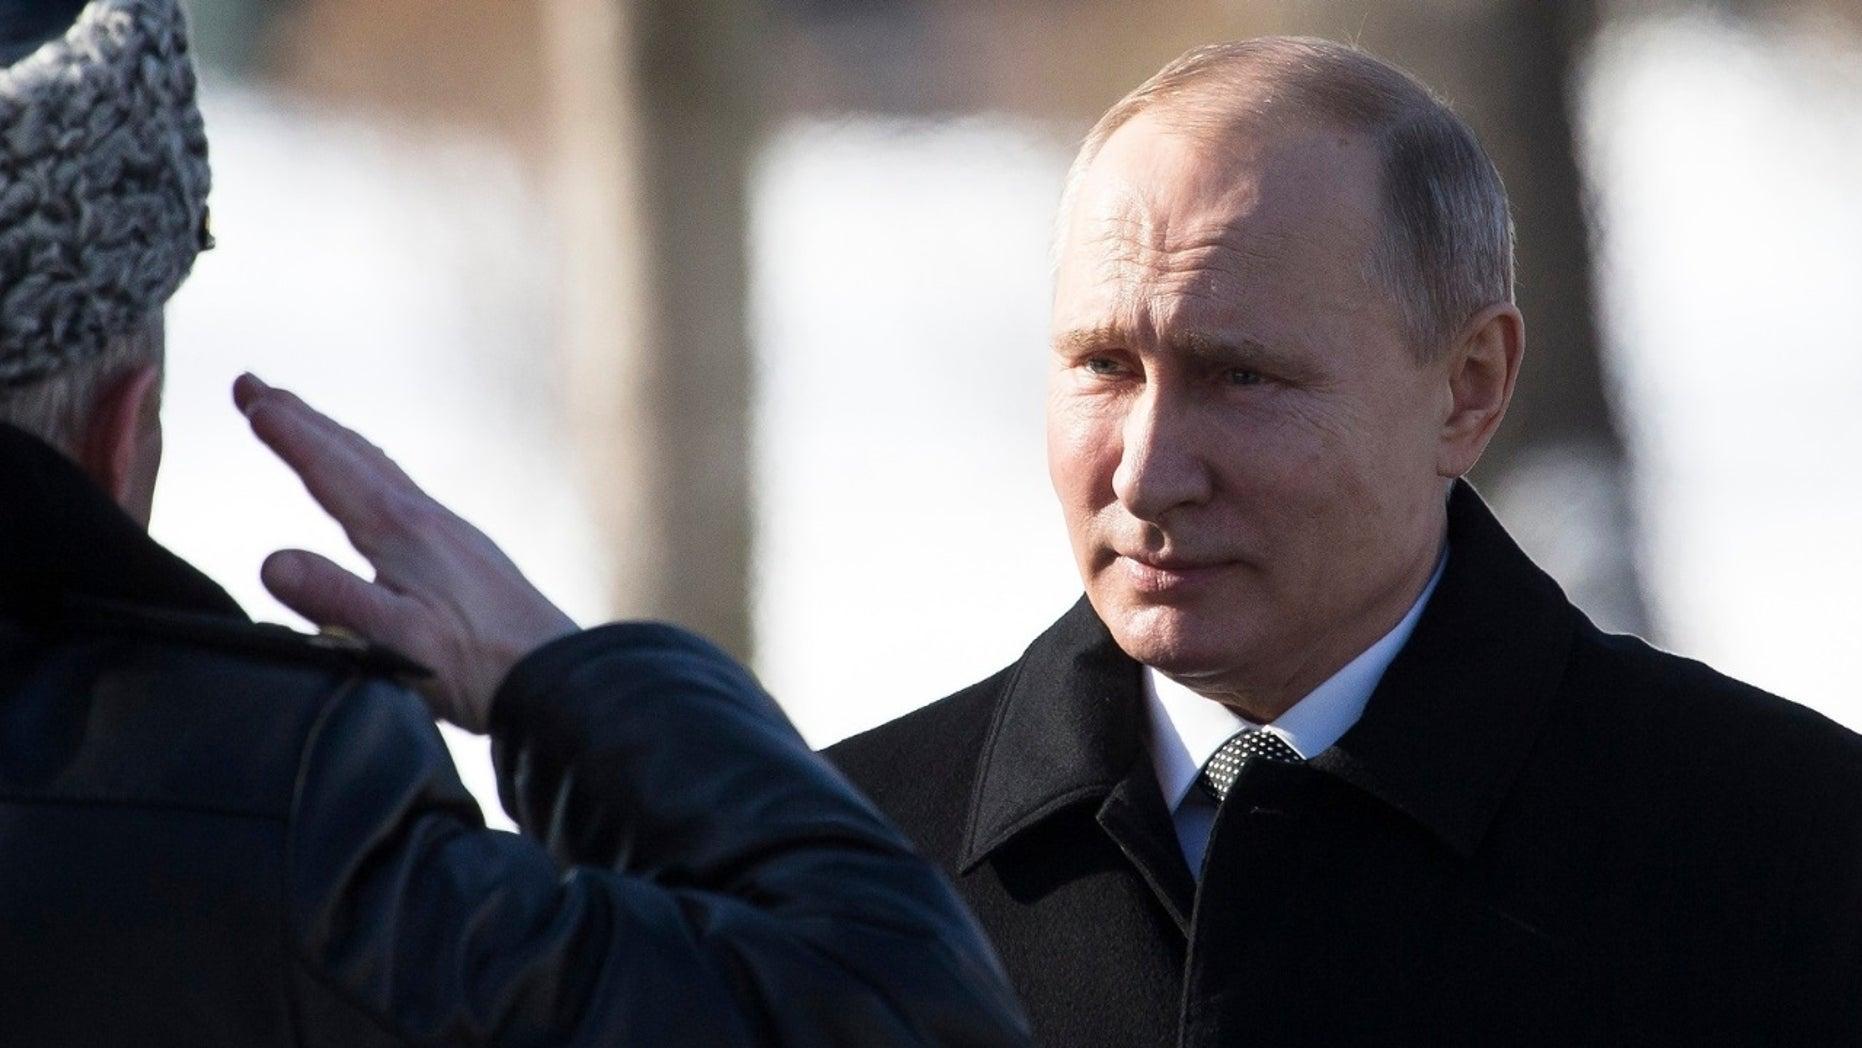 Russian President Vladimir Putin seen here on February 23, 2018.